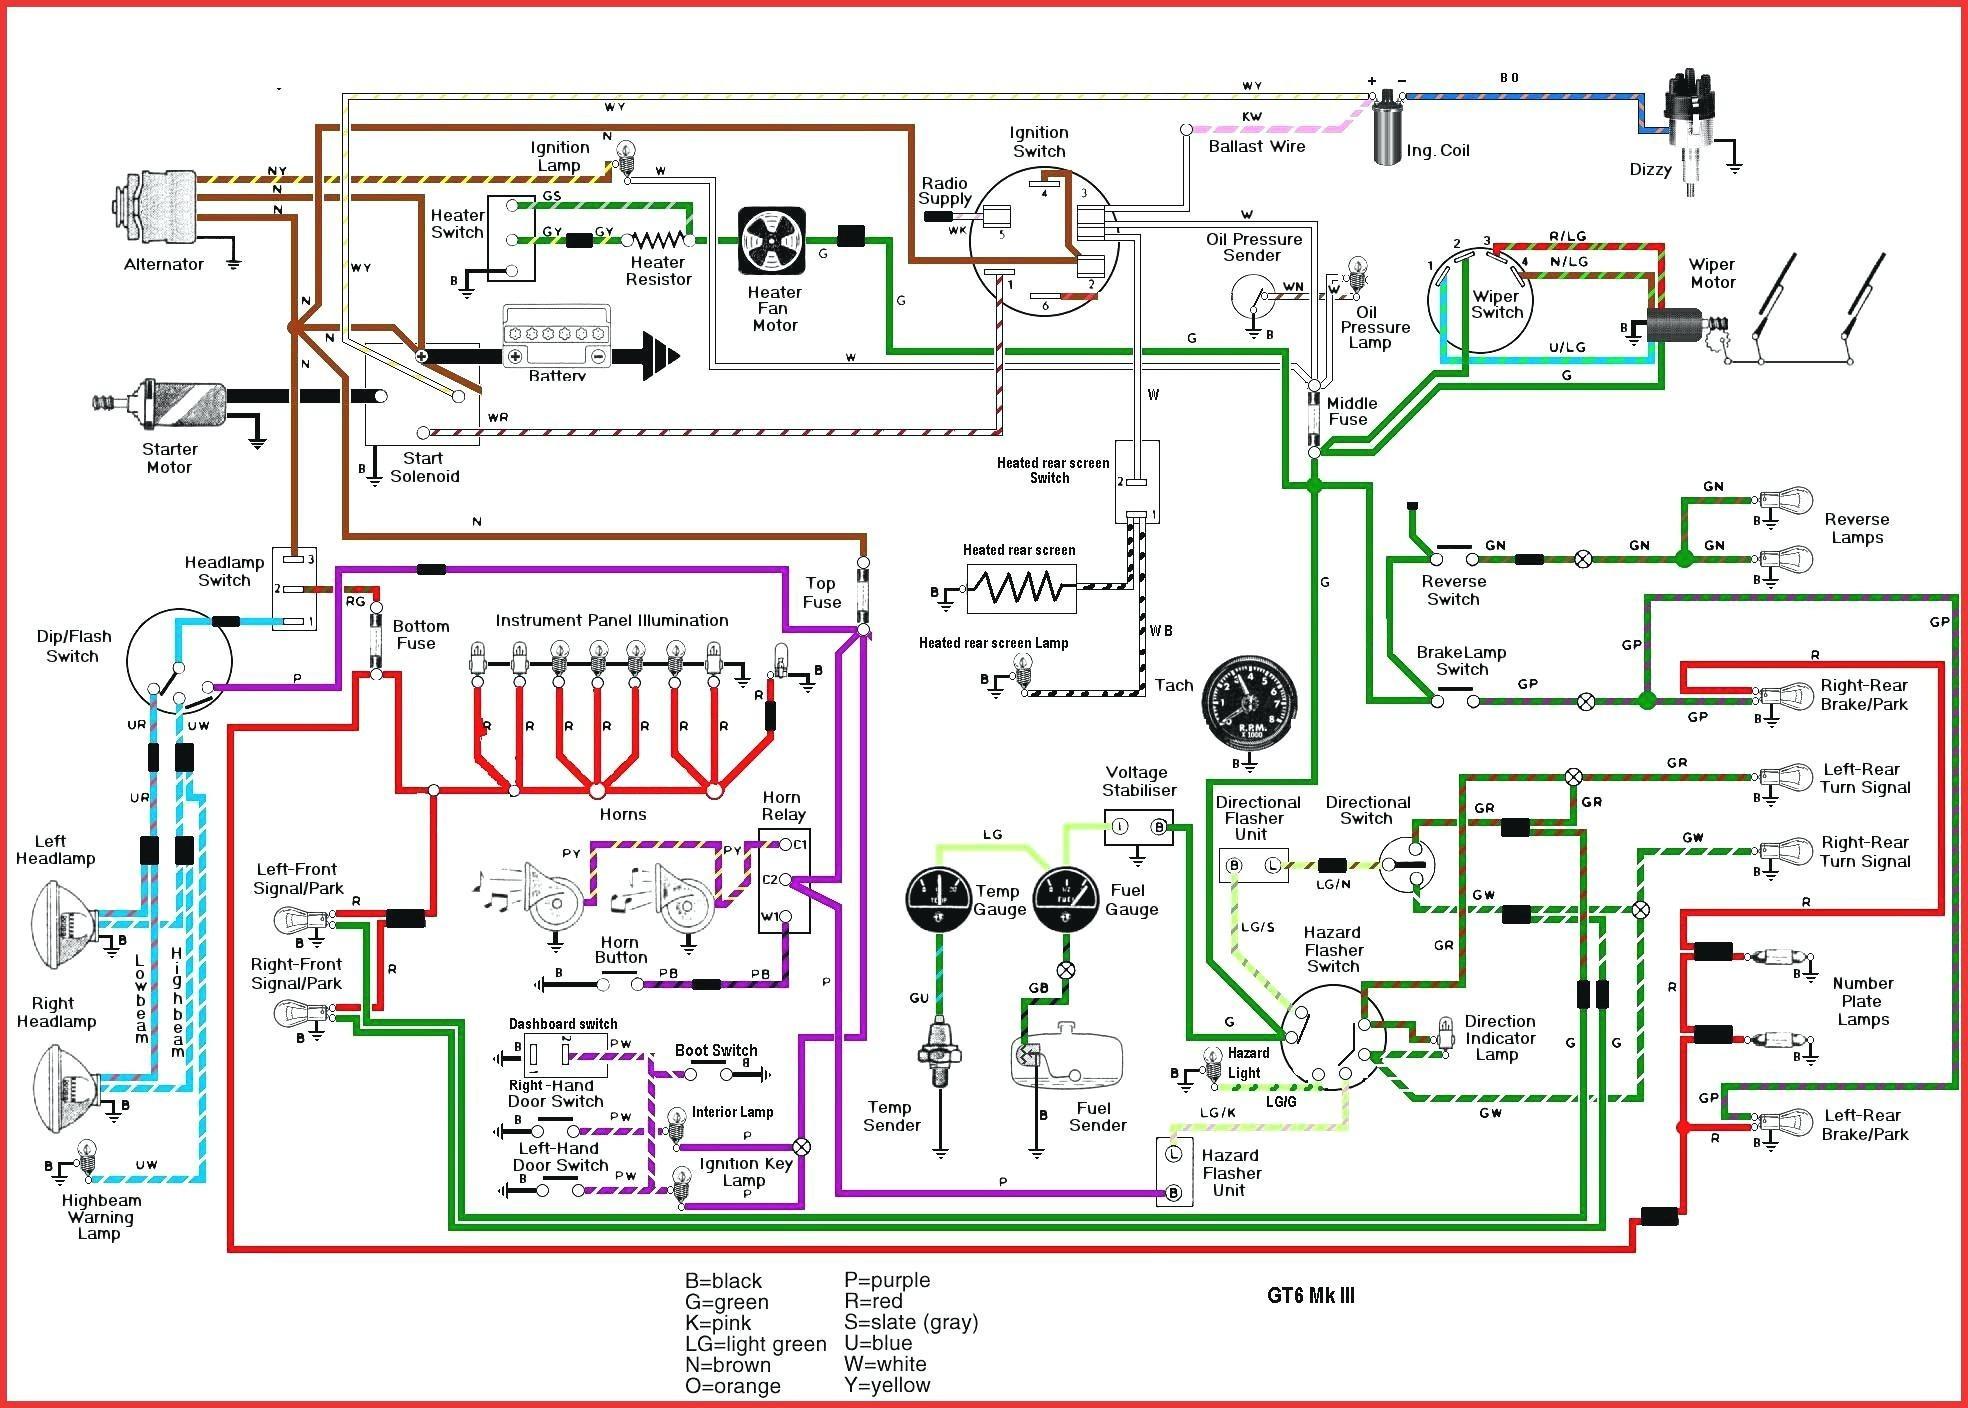 Gm 4942 Legends Race Car Wiring Diagram Wiring Diagram Wiring Diagram